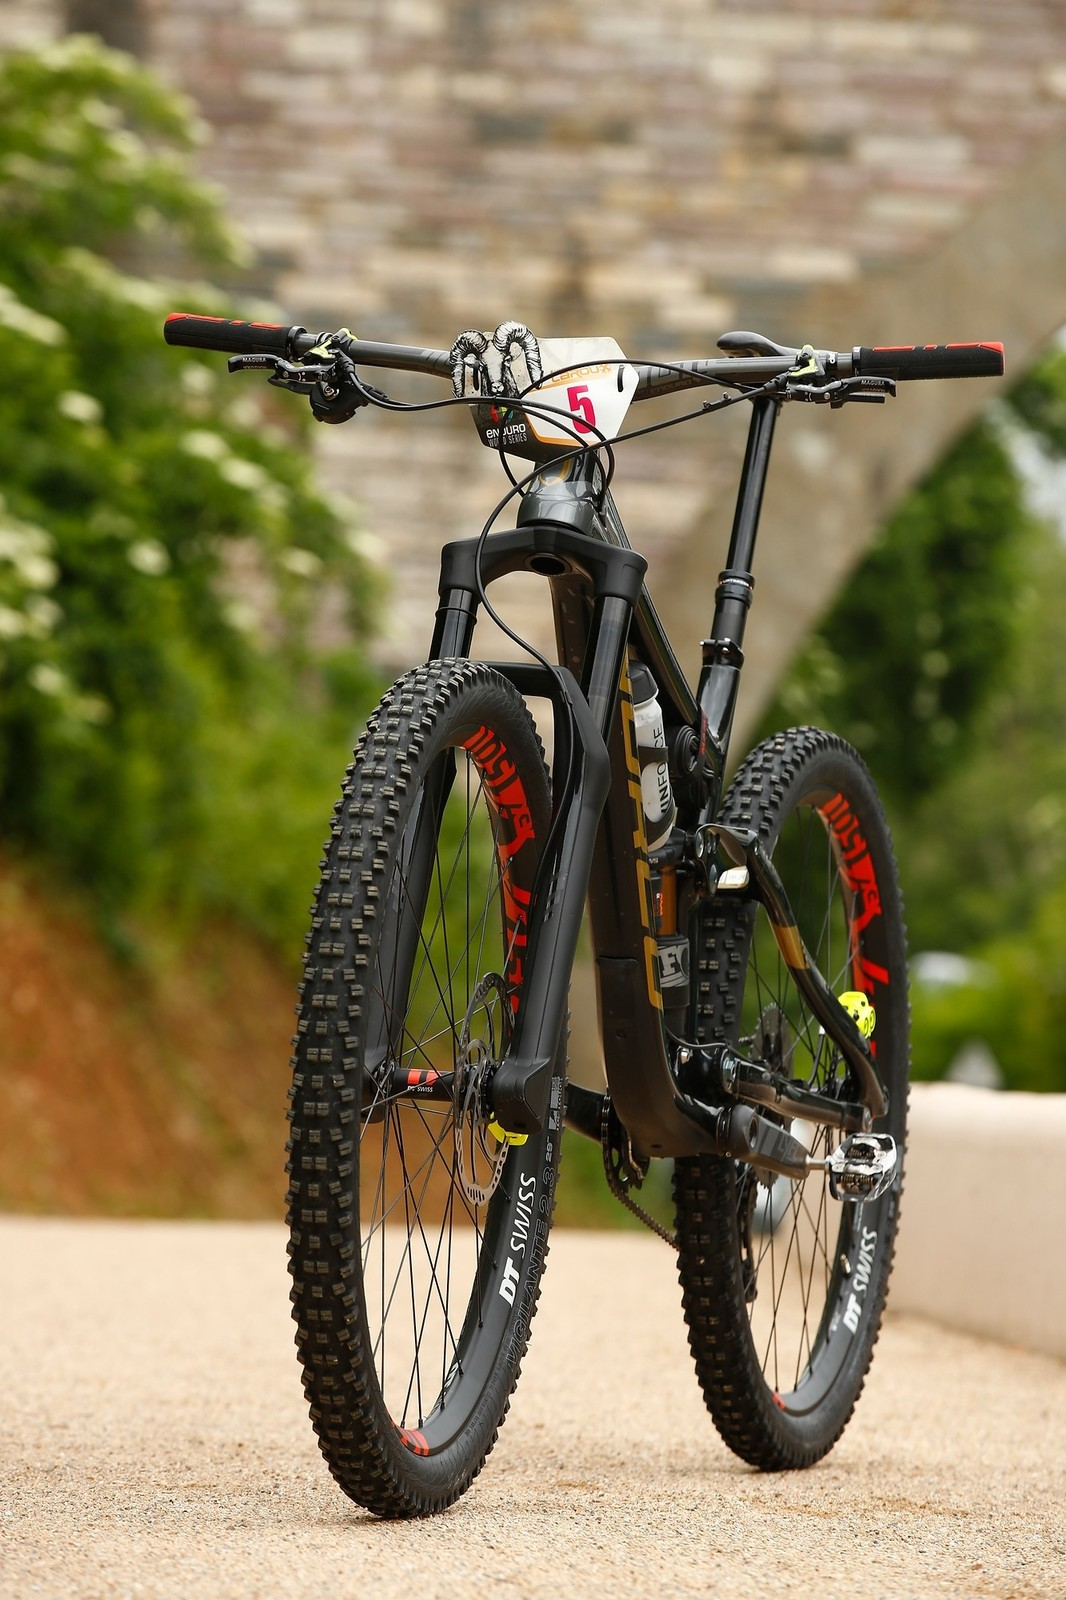 Prototype Fork on Caro Gehrig's Norco Range 29er - Bike Check: Caro Gehrig's Norco 29er - Mountain Biking Pictures - Vital MTB